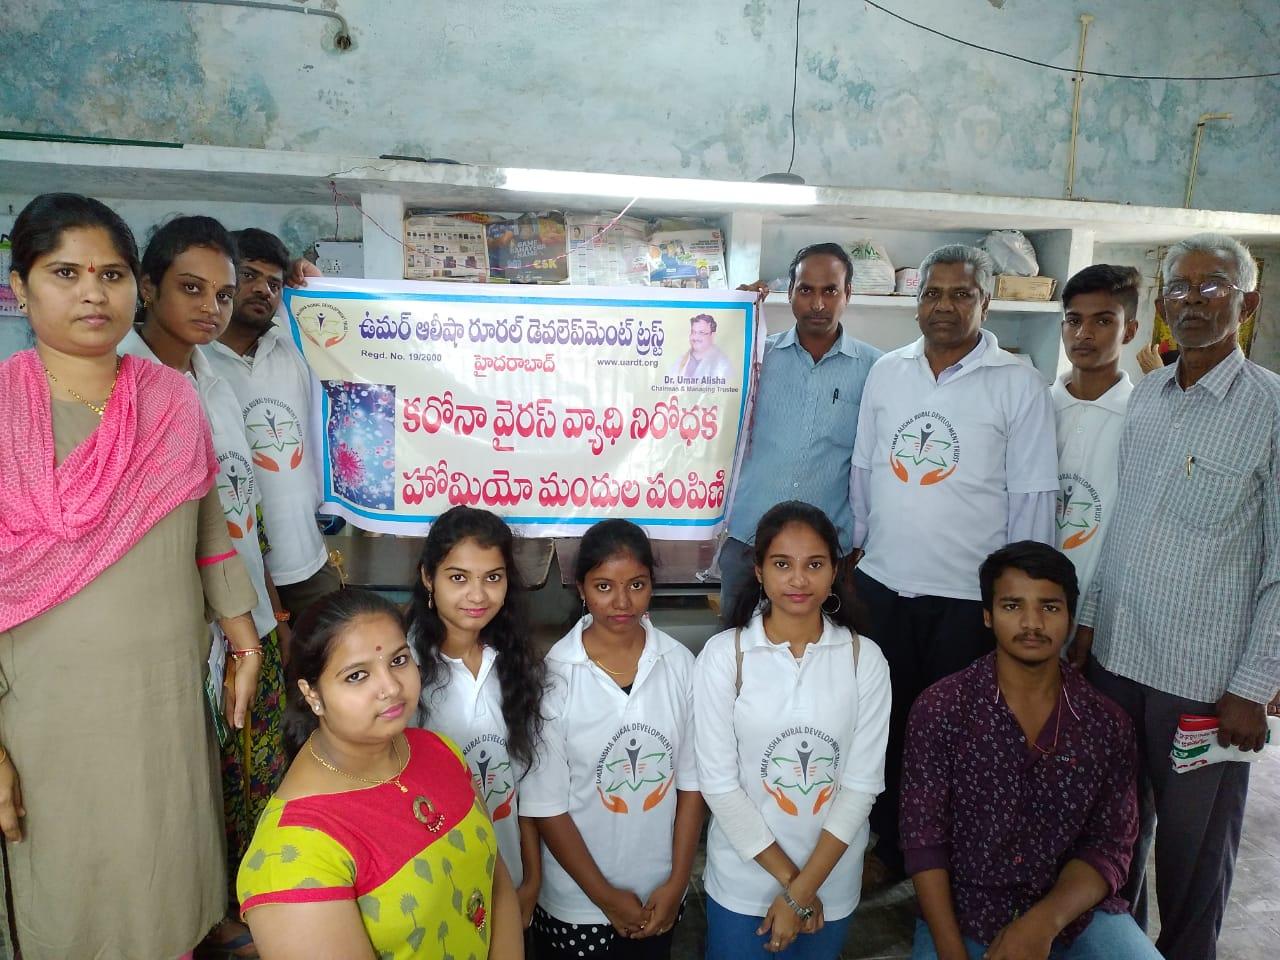 05-CoronaVirus-Preventive-Medicine-Distributed-Hyderabad-Telengana-01022020